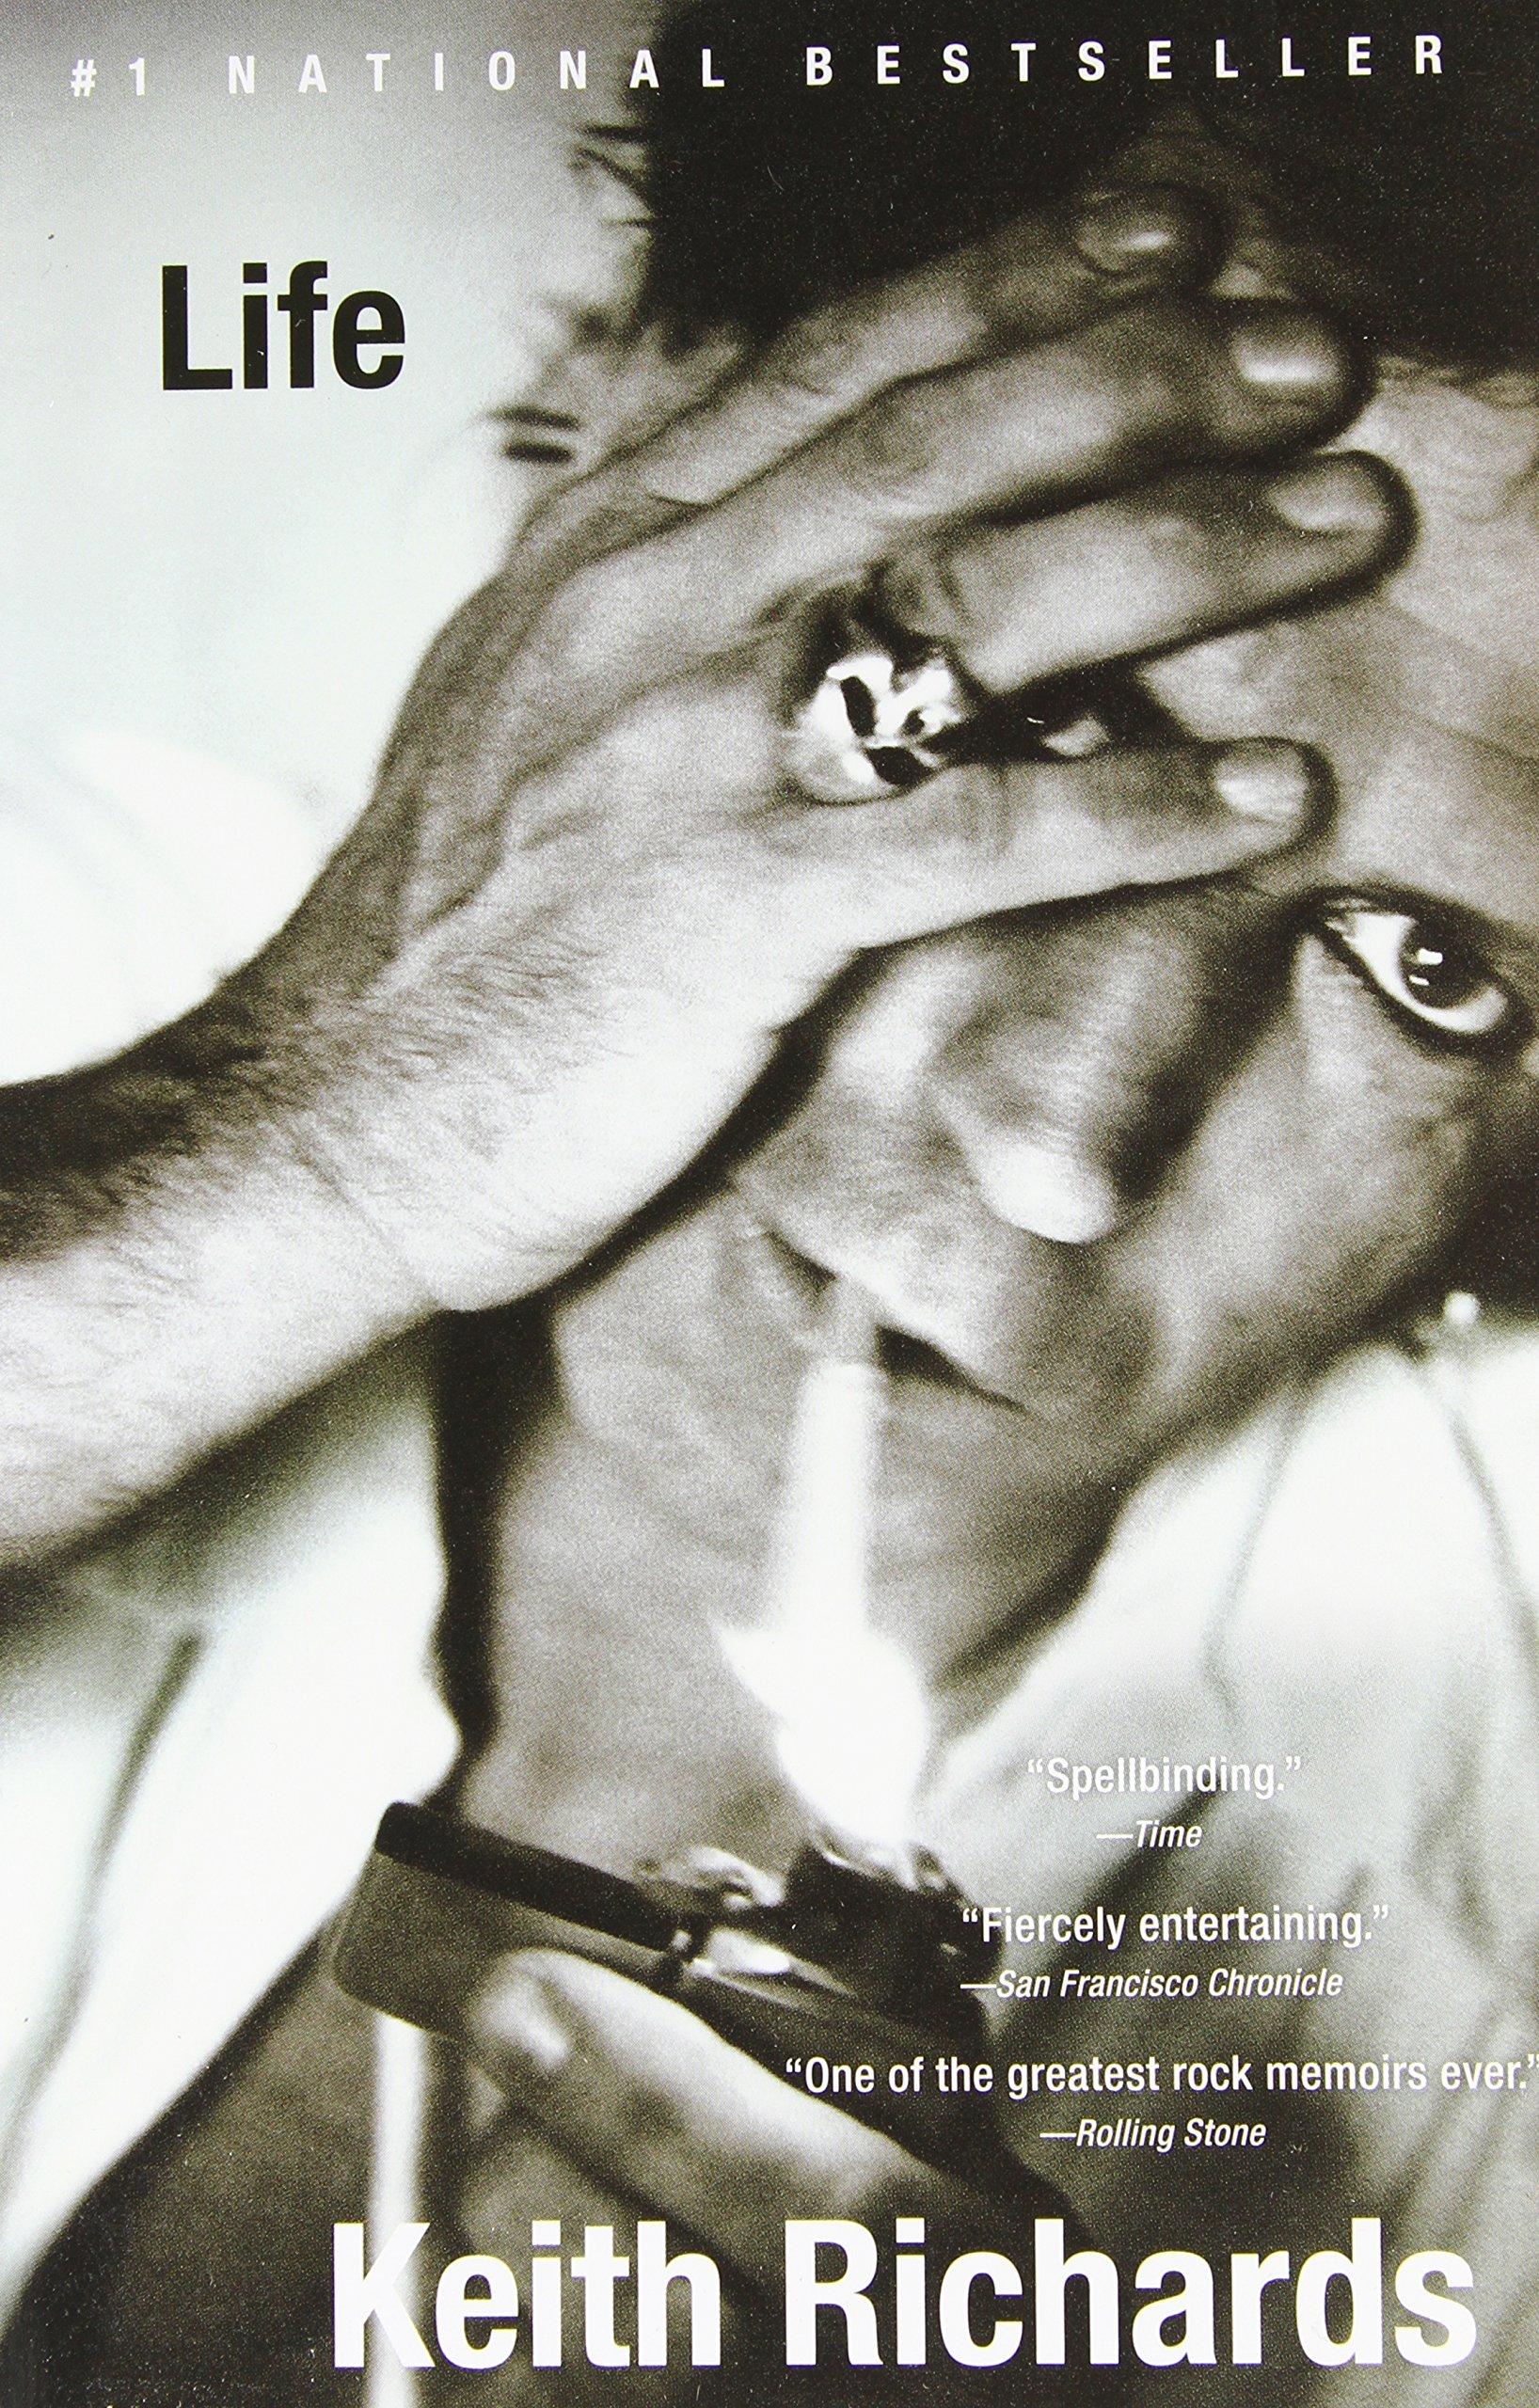 5 MUSIC ICONS & THEIR MEMOIRS - Keith Richards